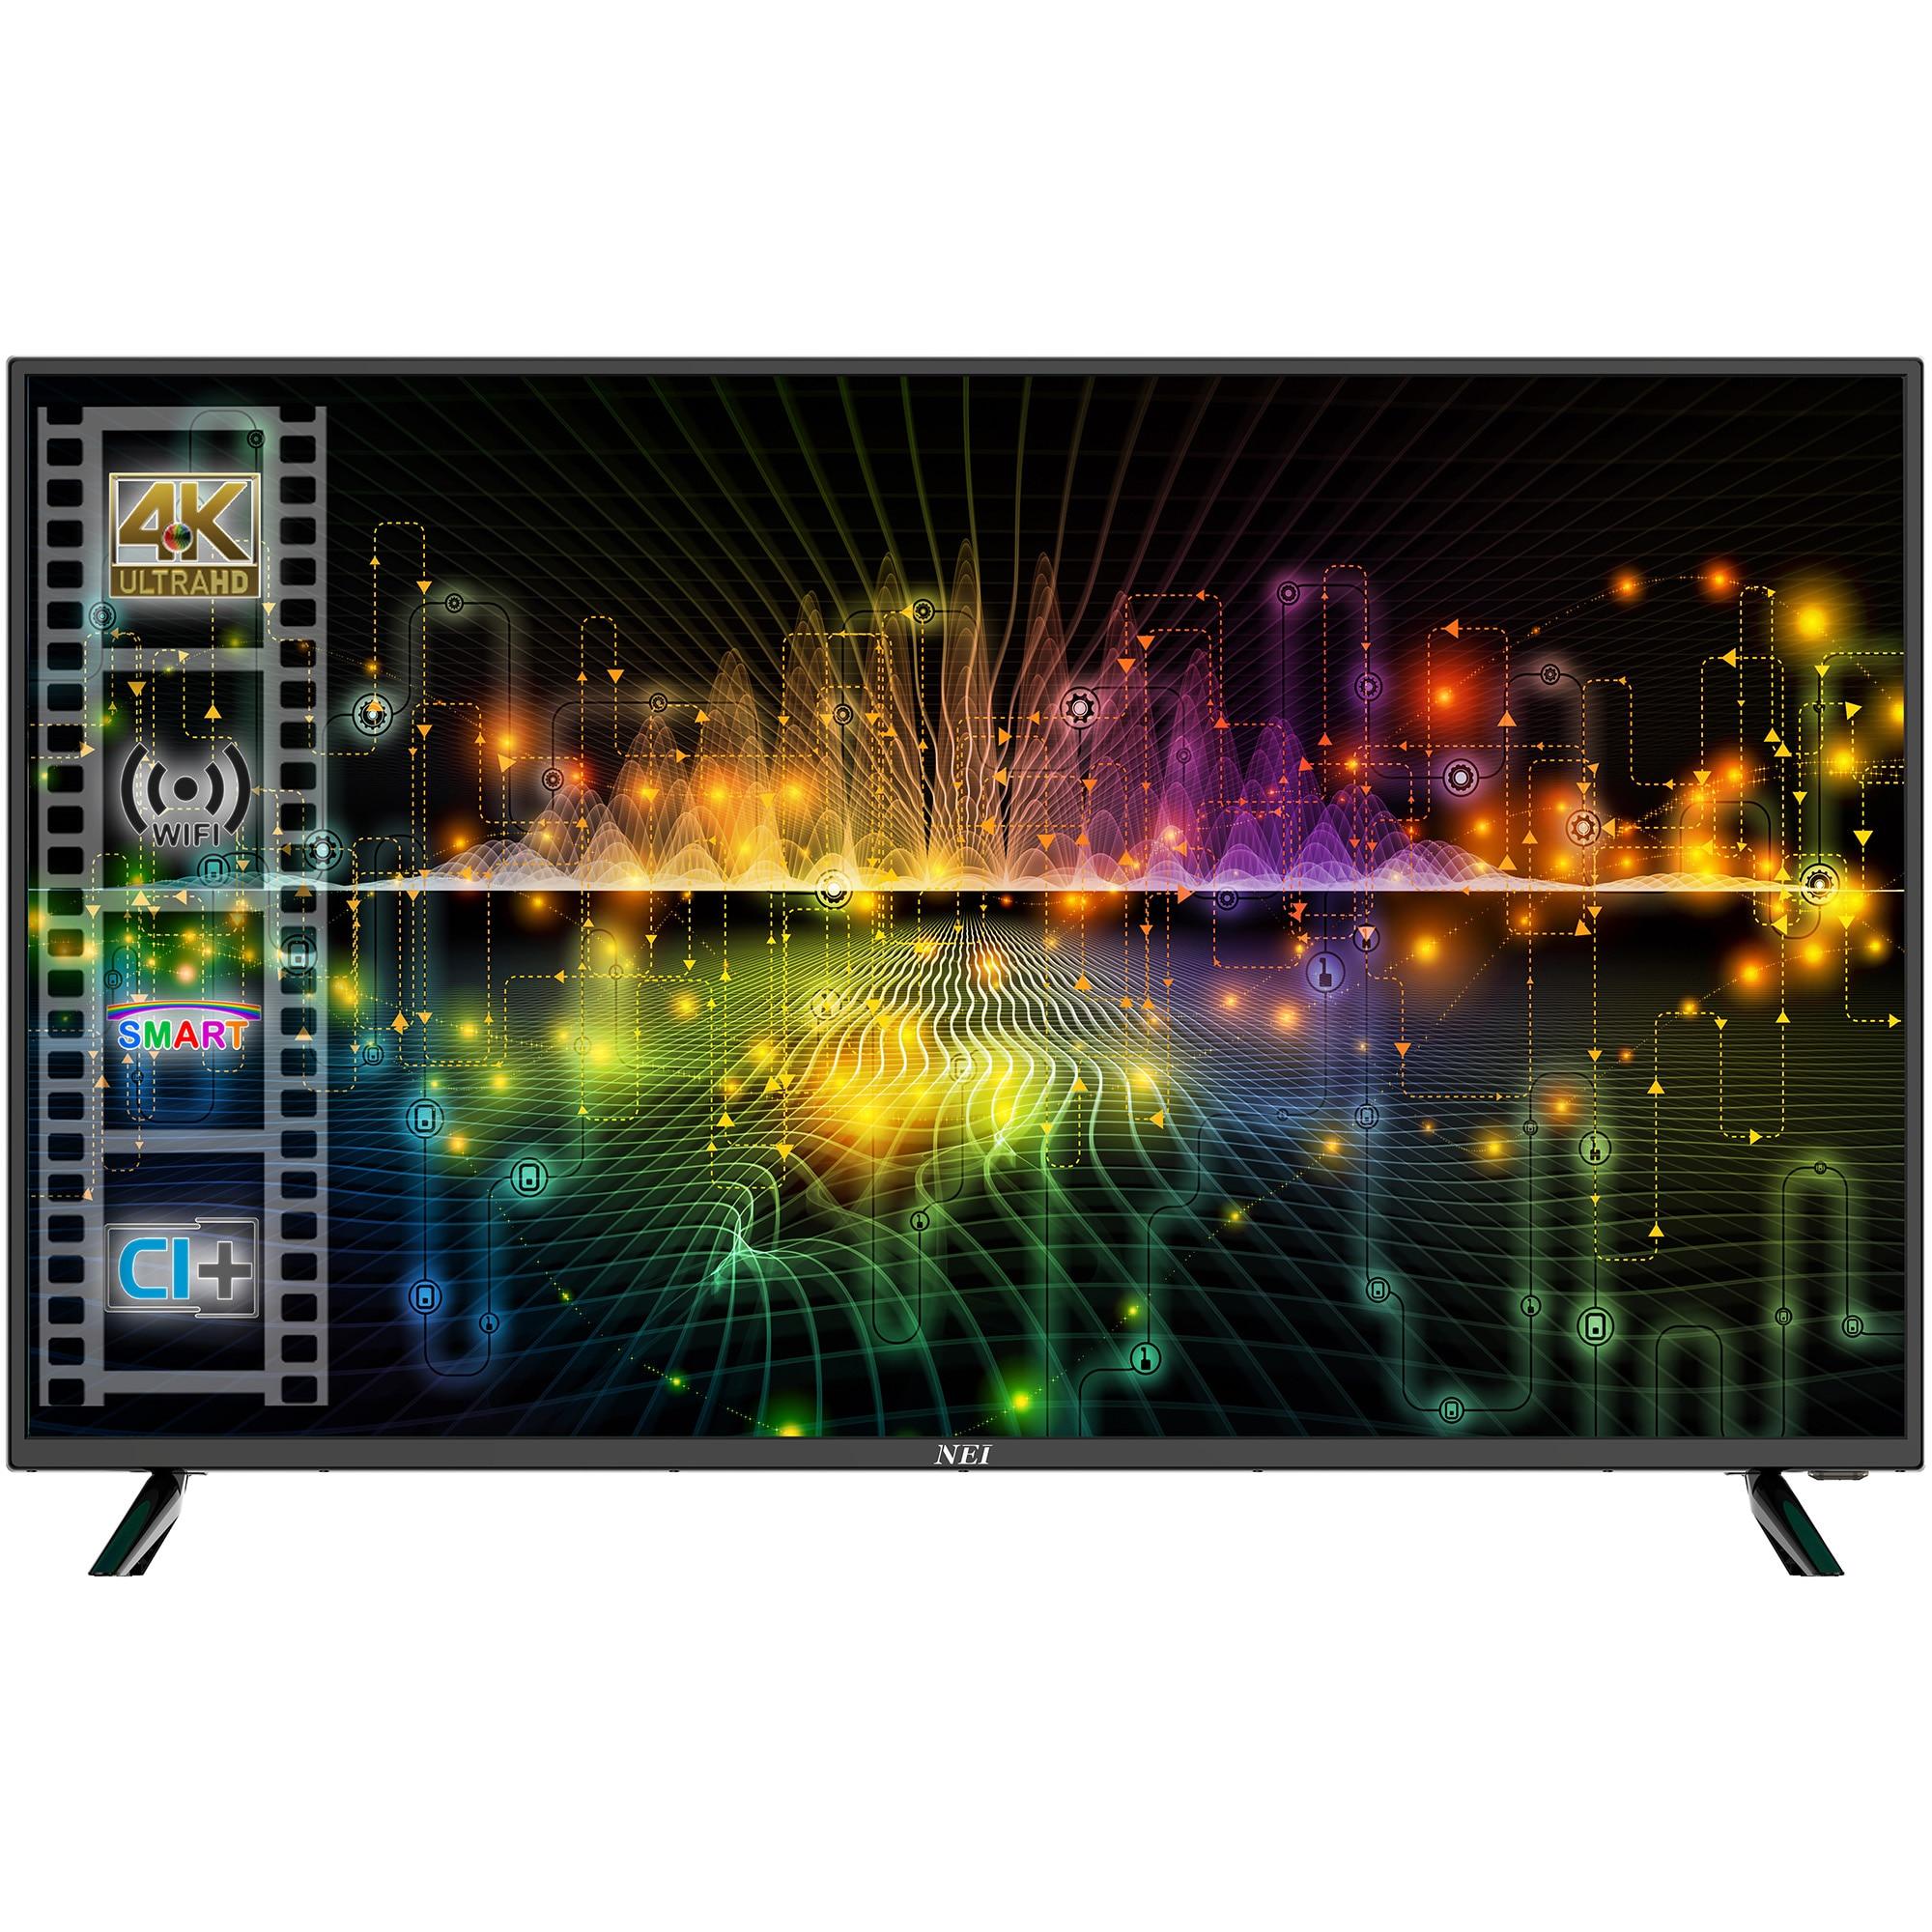 Fotografie Televizor Nei 40NE6700, 100 cm, Smart, 4K Ultra HD, LED